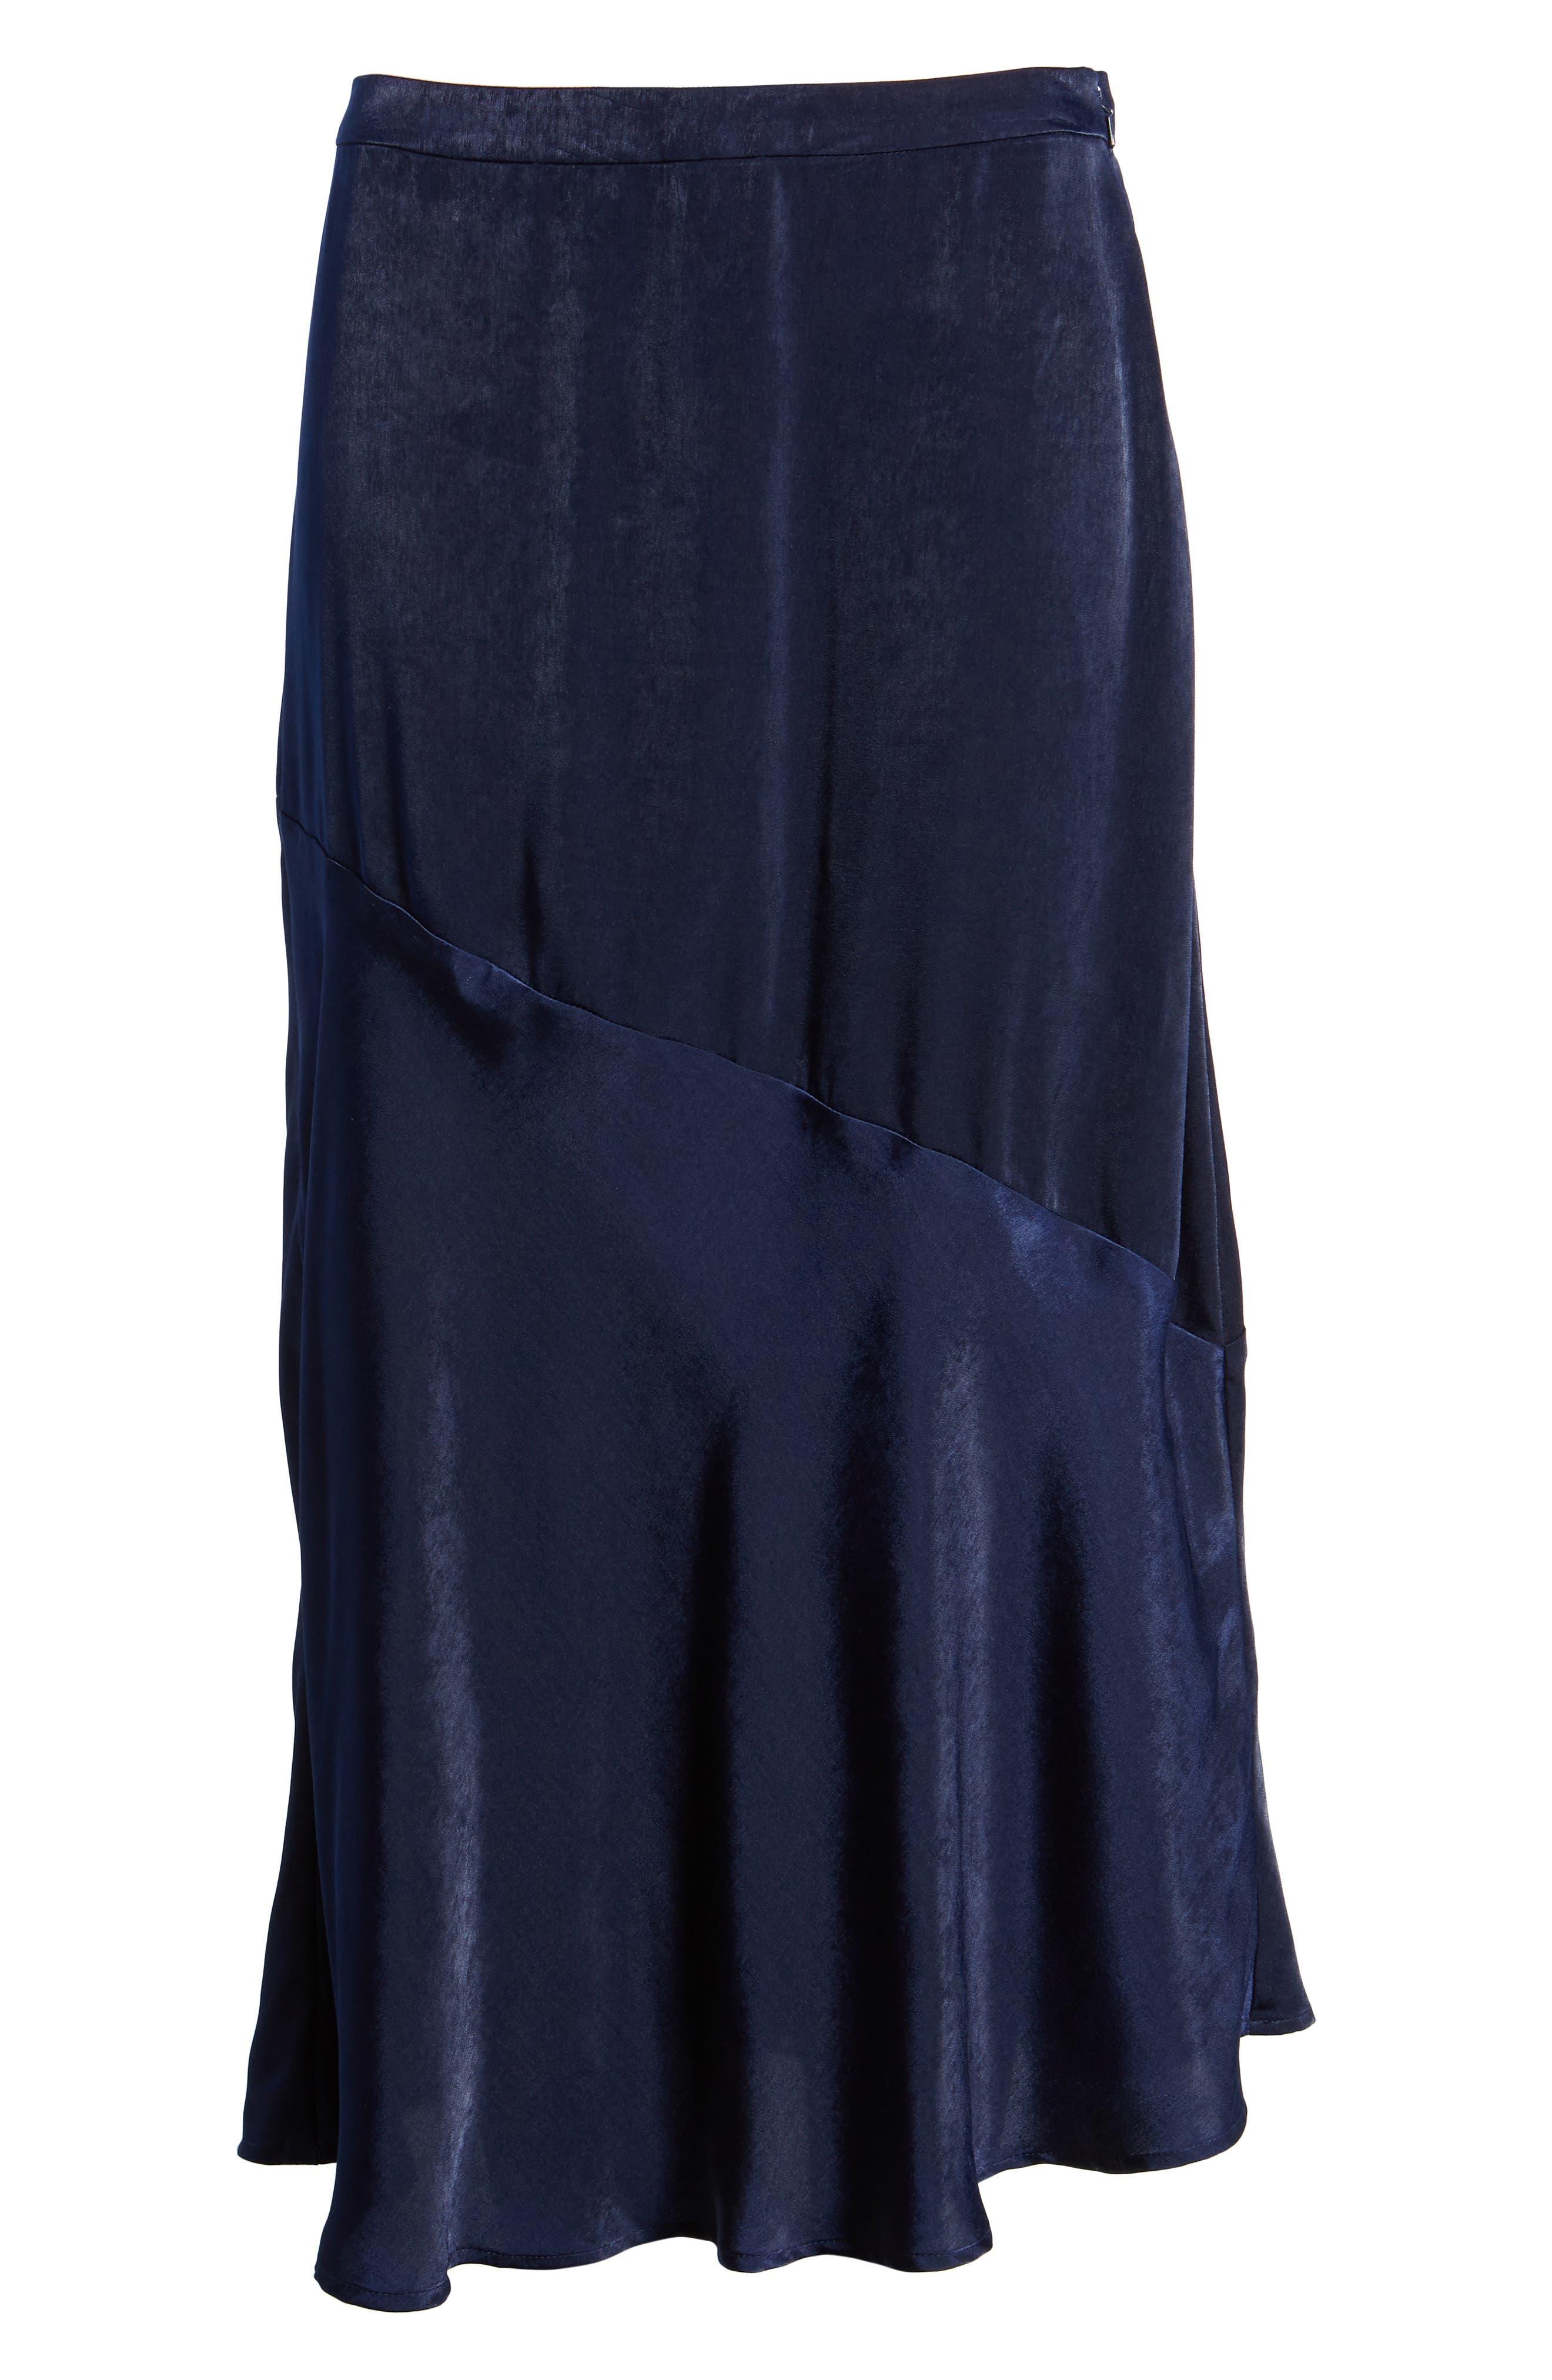 BP Satin Midi Skirt,                             Alternate thumbnail 6, color,                             410